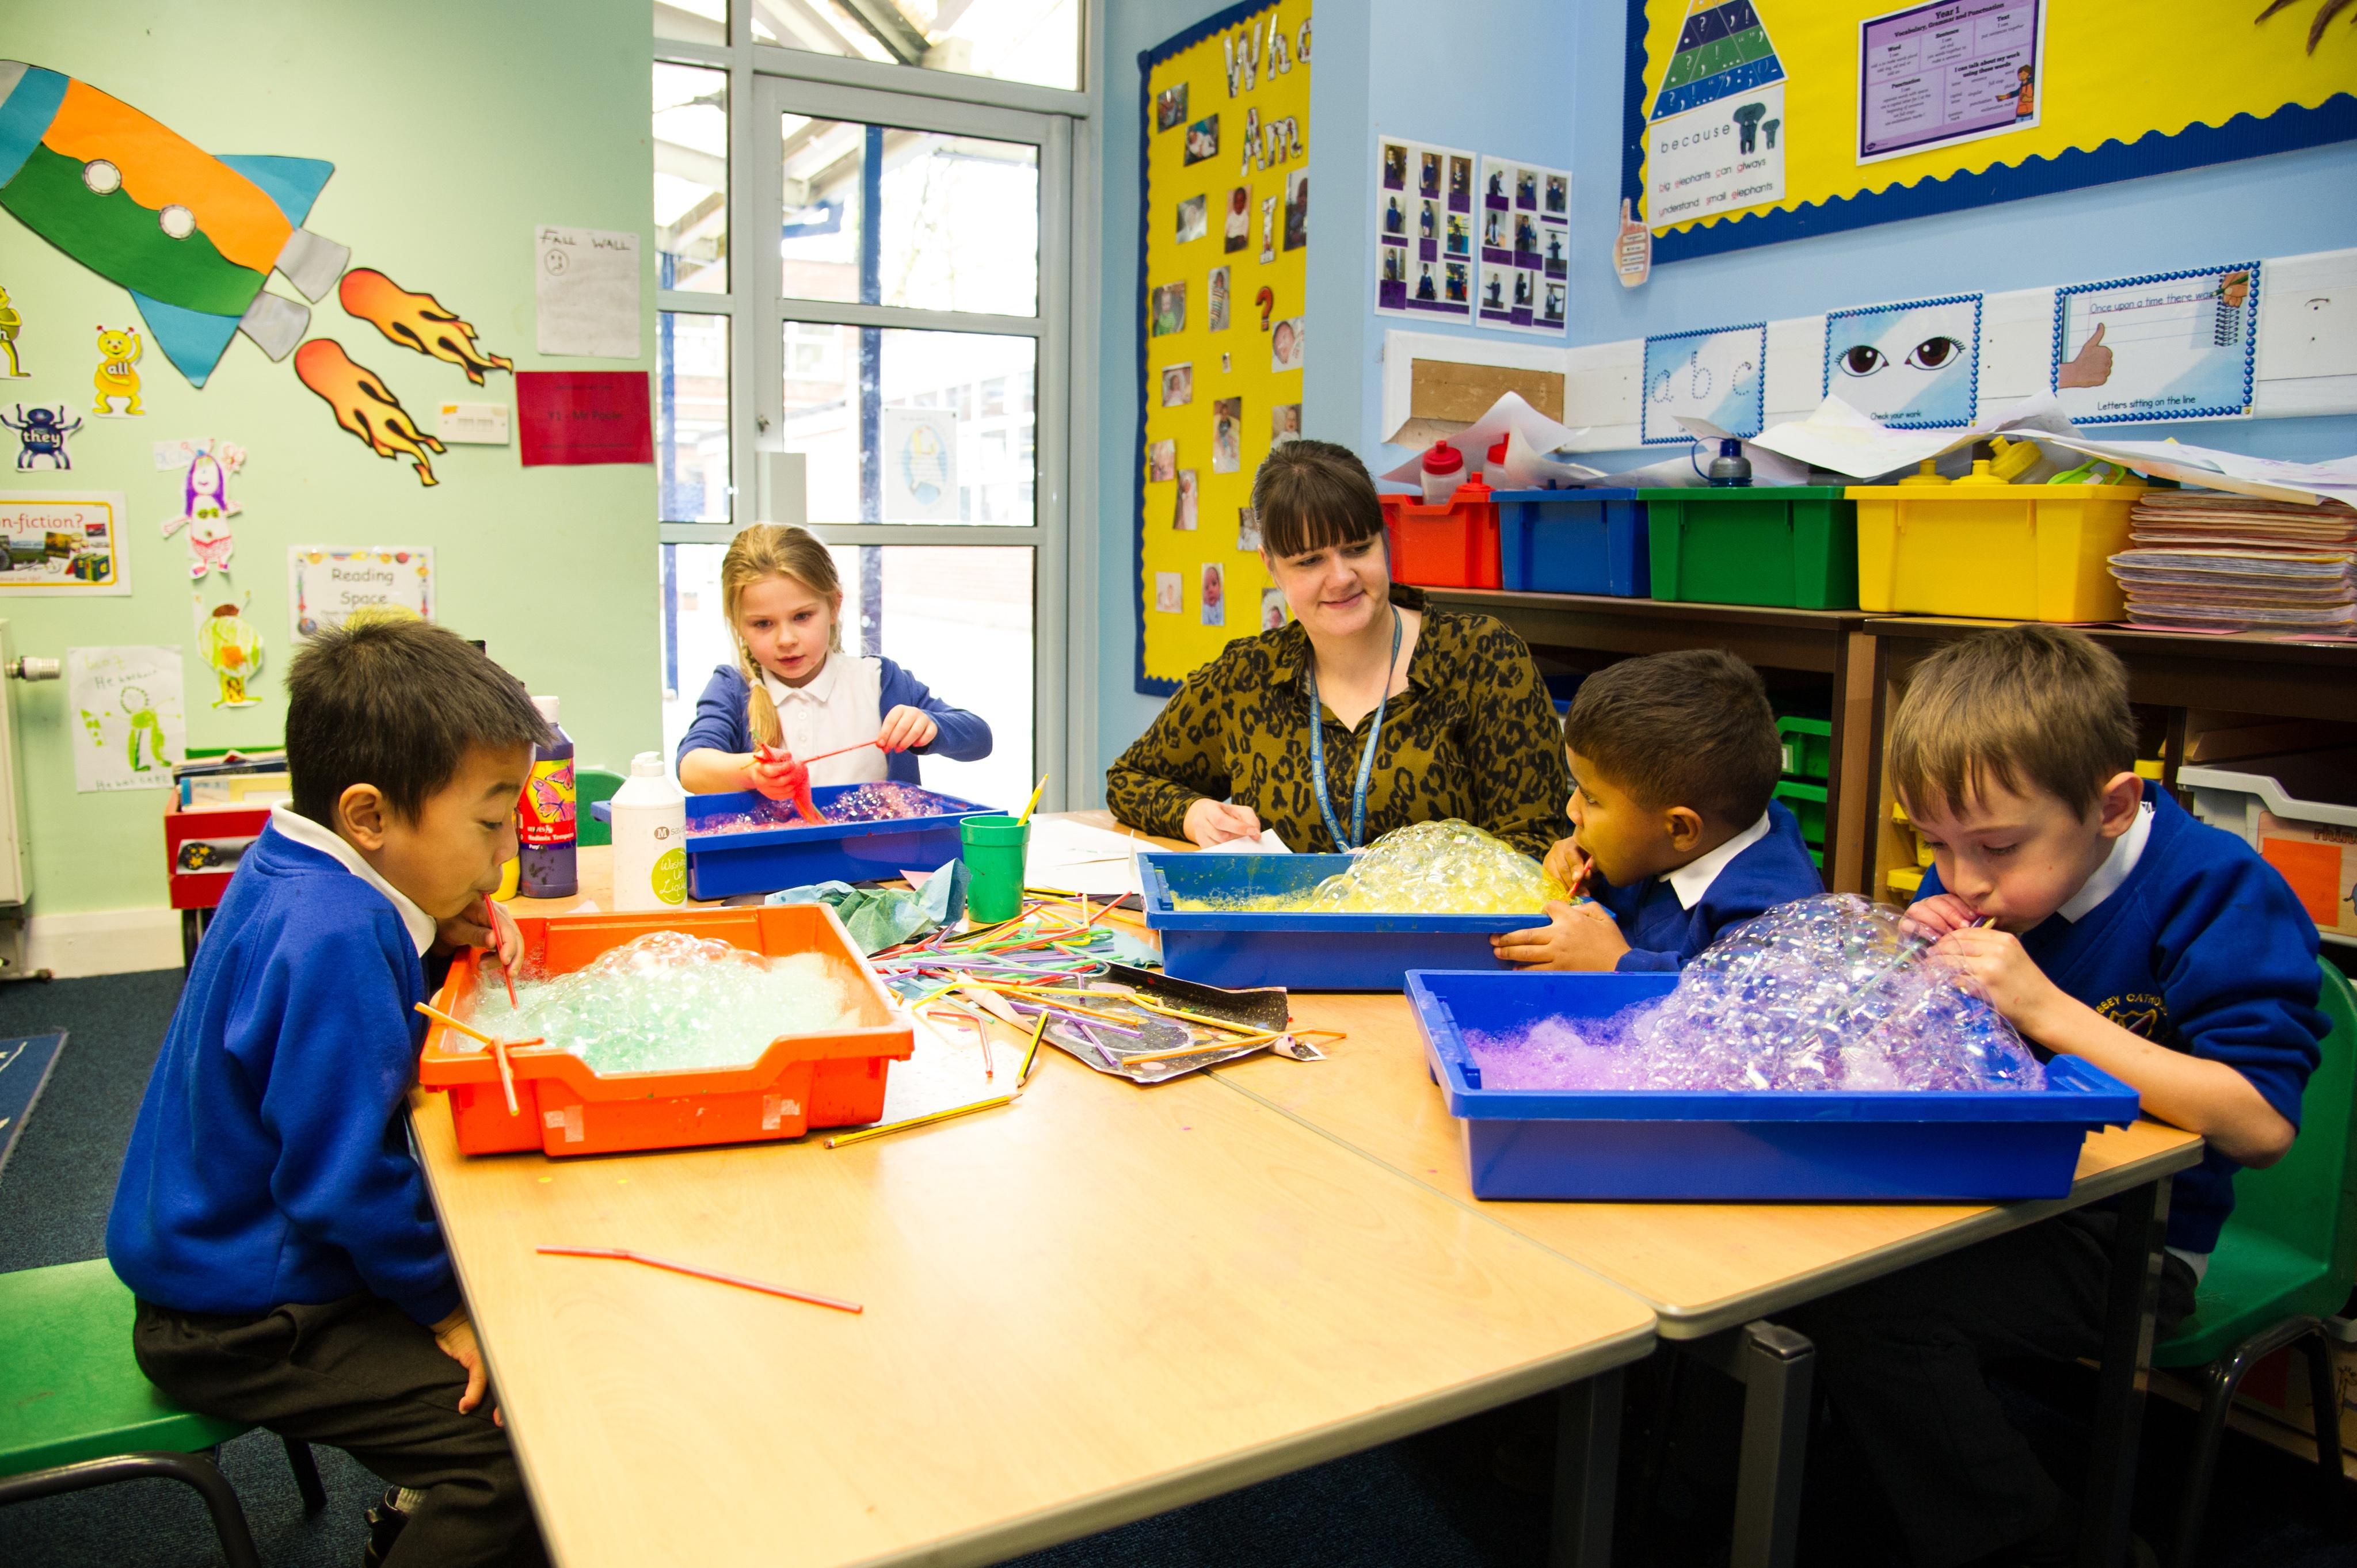 www.kirstenholst.com - Abbey Catholic Primary School